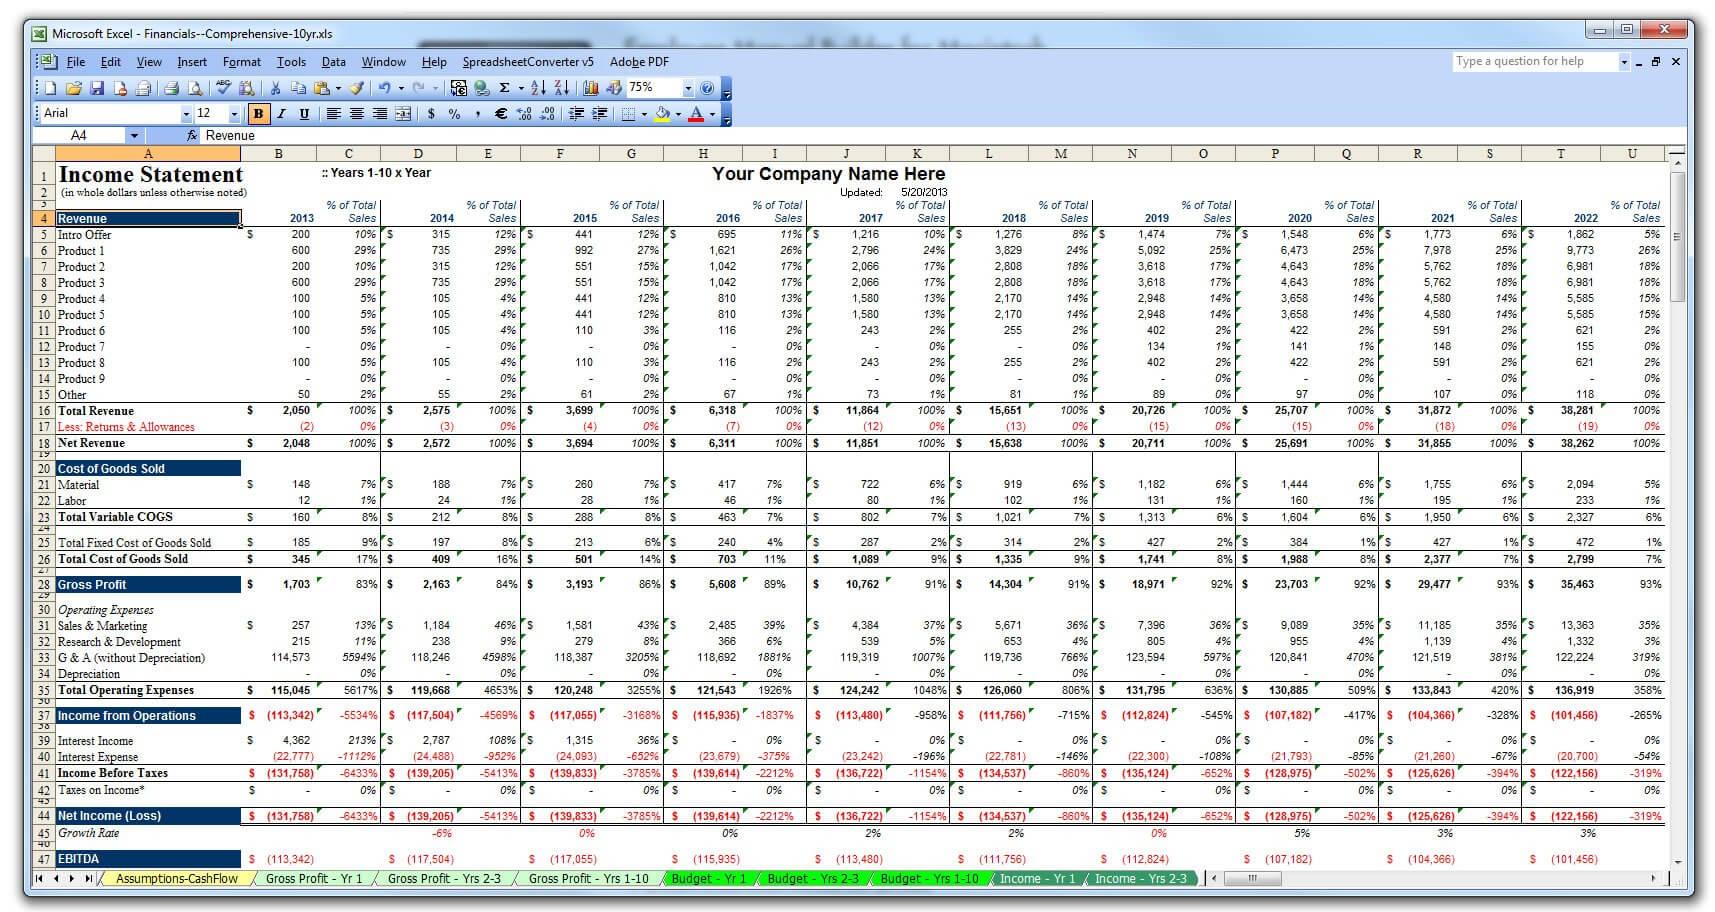 Excel Business Plan Template Stark Houseofstrauss Co In Business Plan Financial Template Excel Download